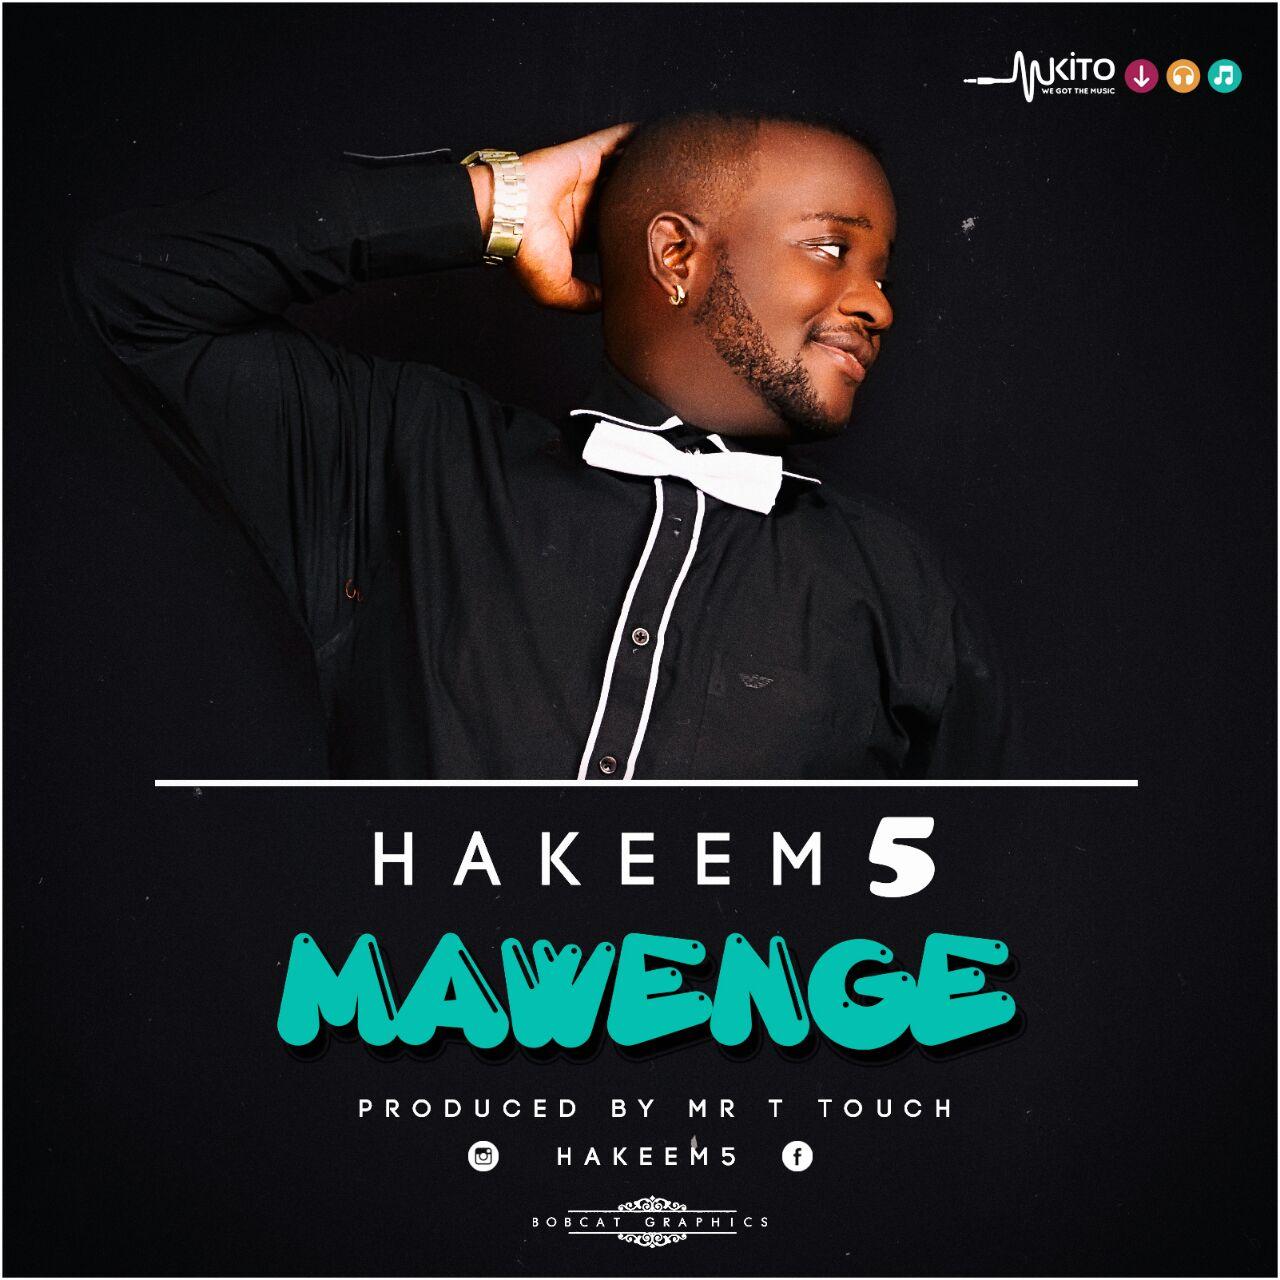 Hakeem 5 - Hakeem 5 - Mawenge